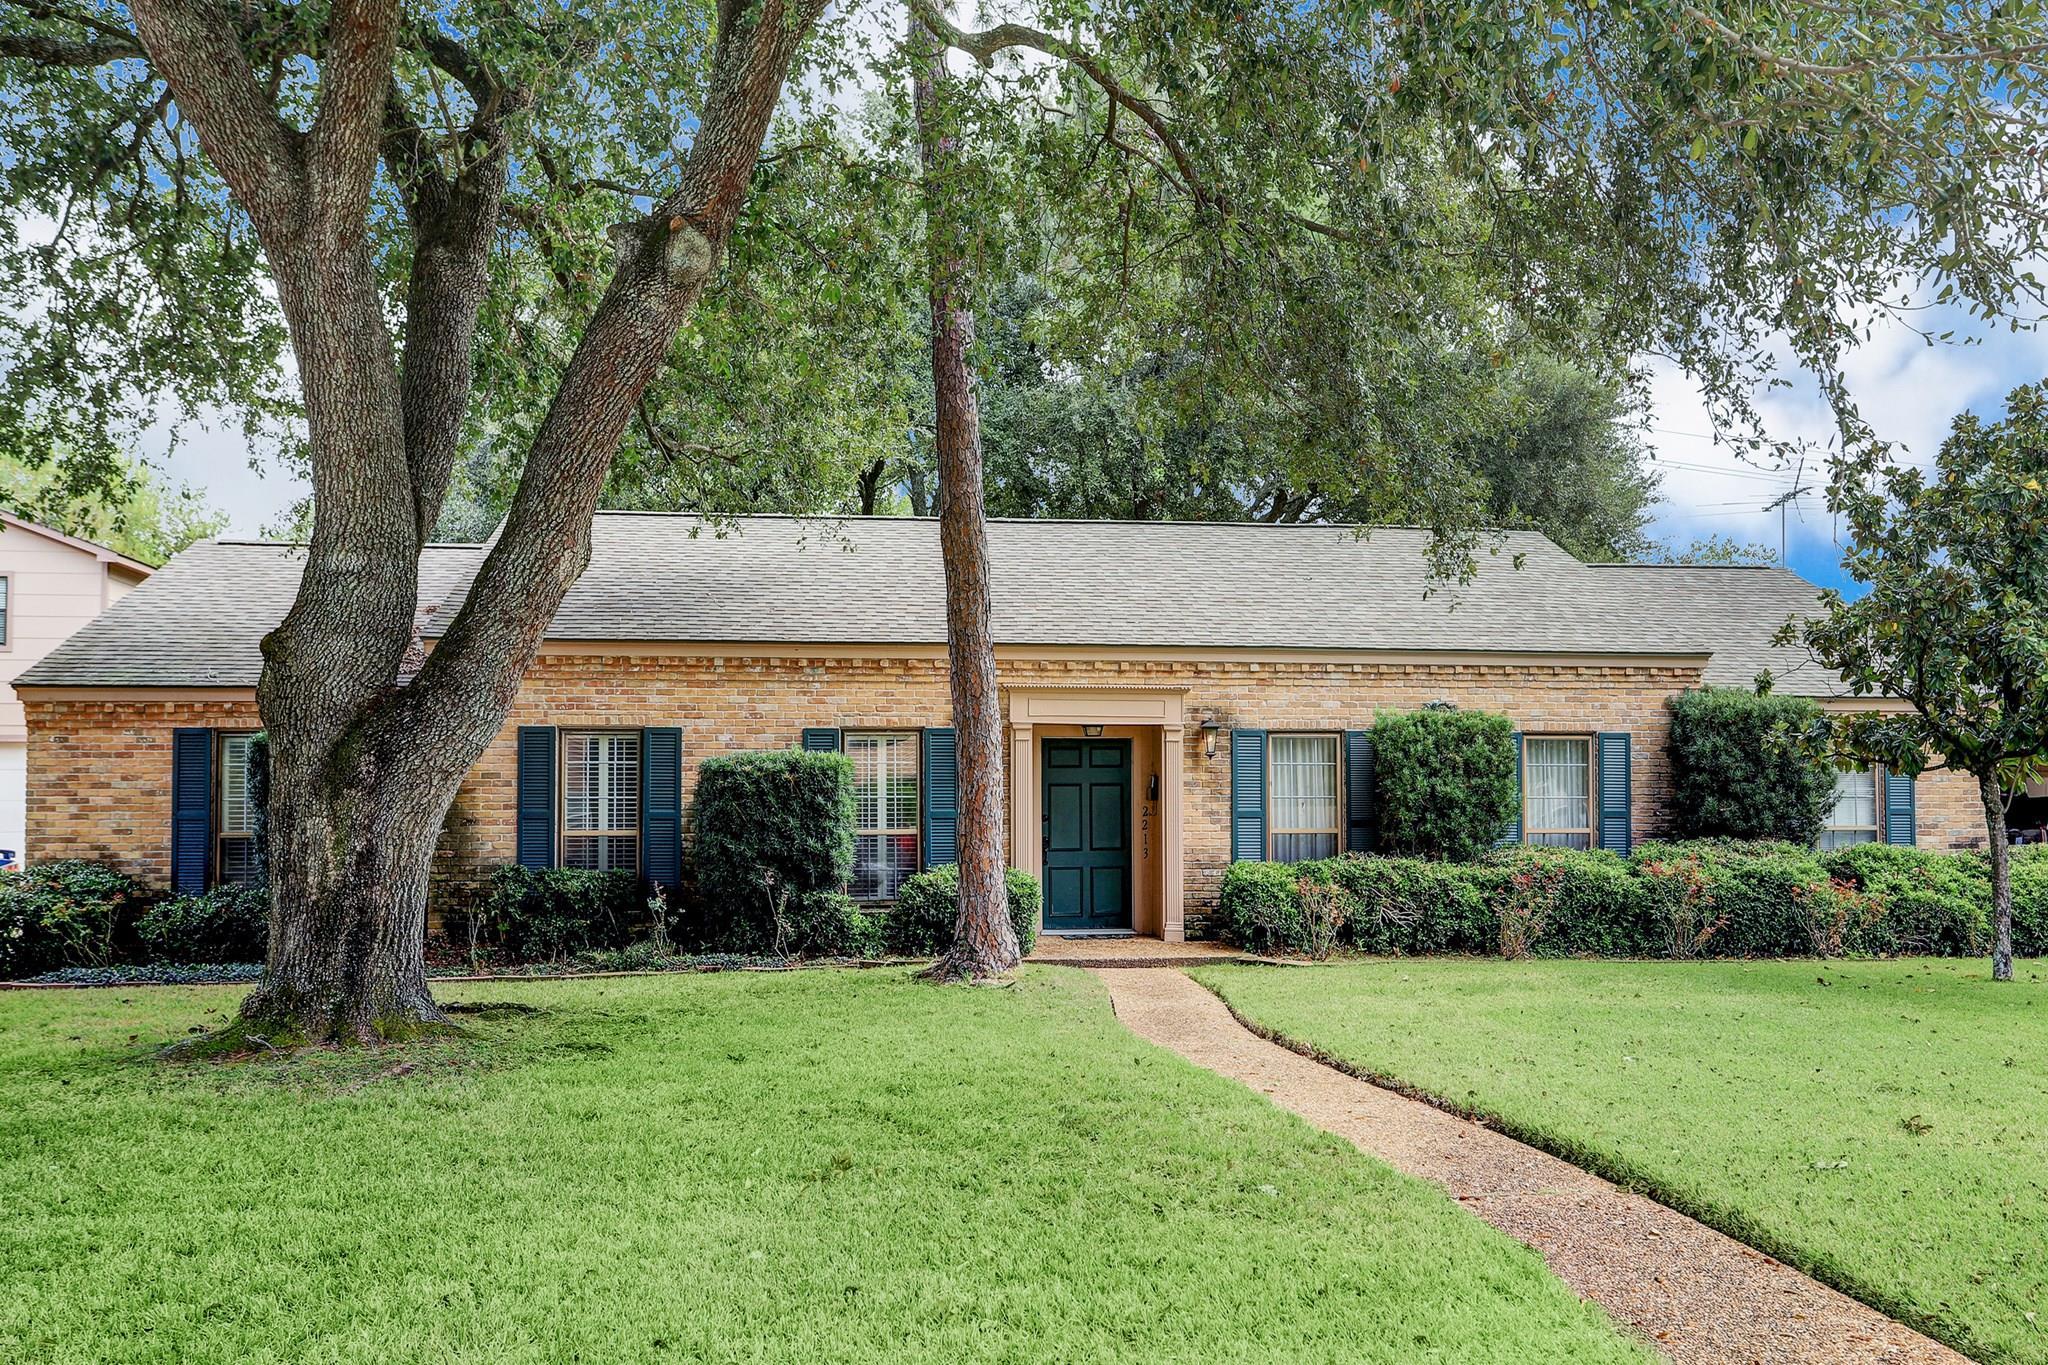 2213 N Memorial Court Property Photo - Pasadena, TX real estate listing